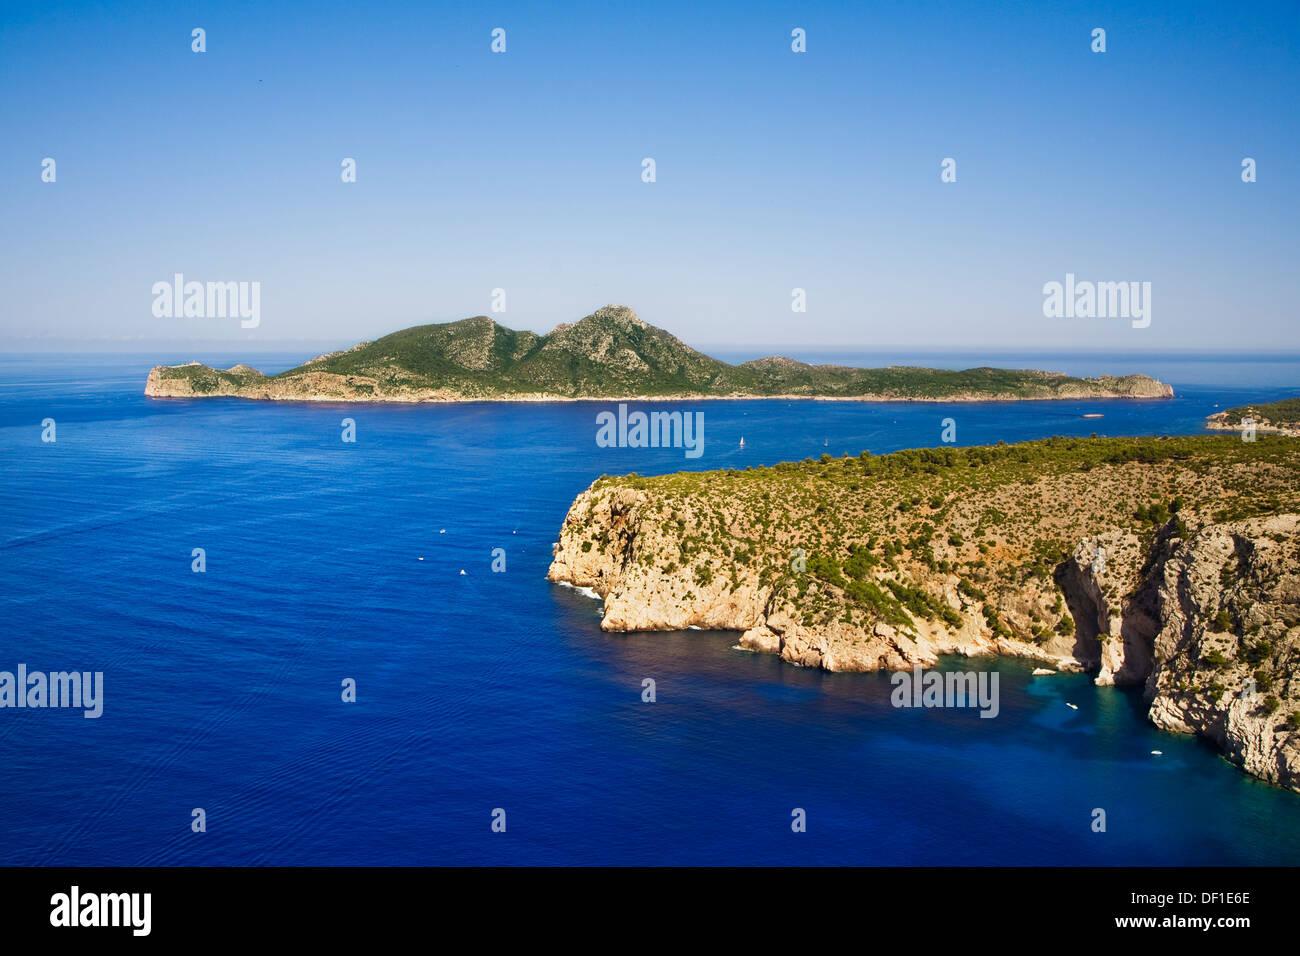 Sa Dragonera island, Majorca, Balearic Islands, Spain Stock Photo